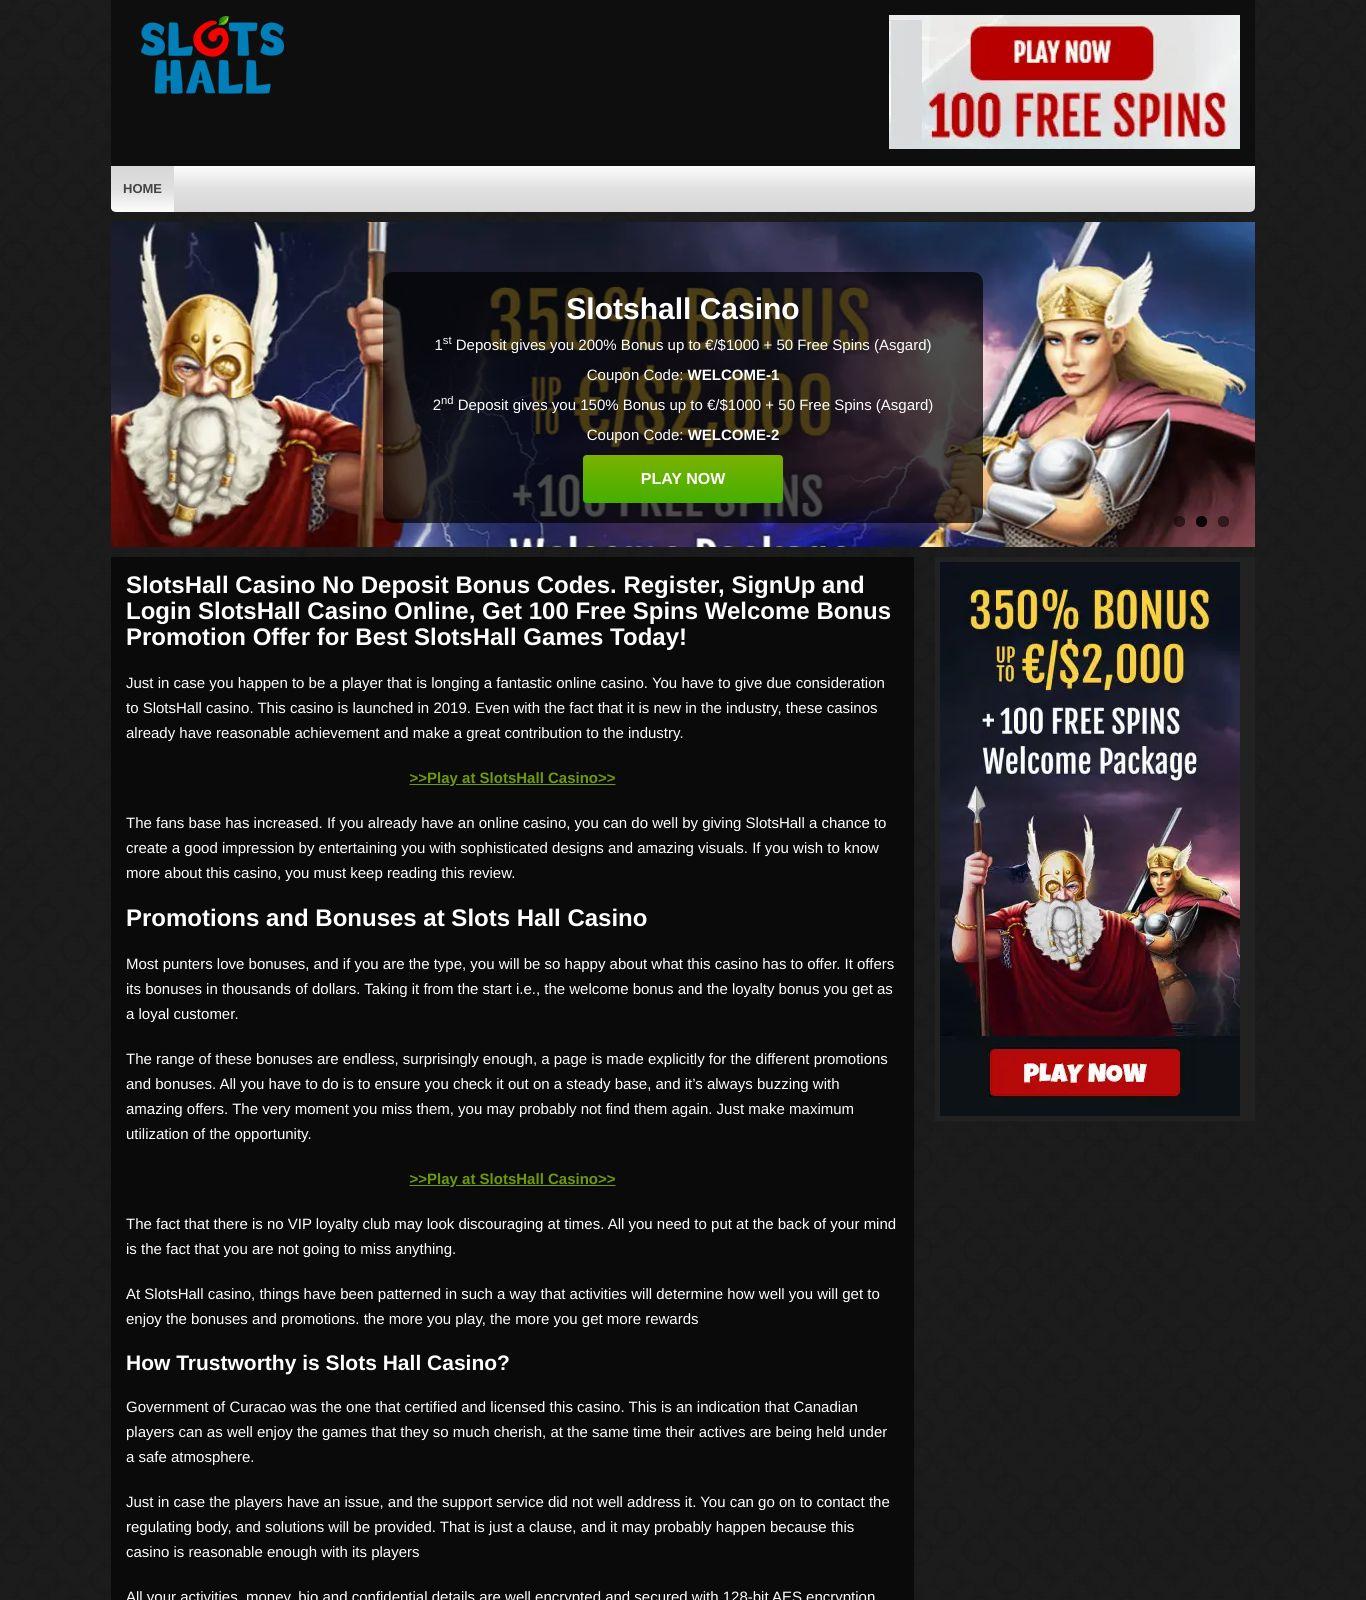 Slotshall Casino No Deposit Bonus Codes